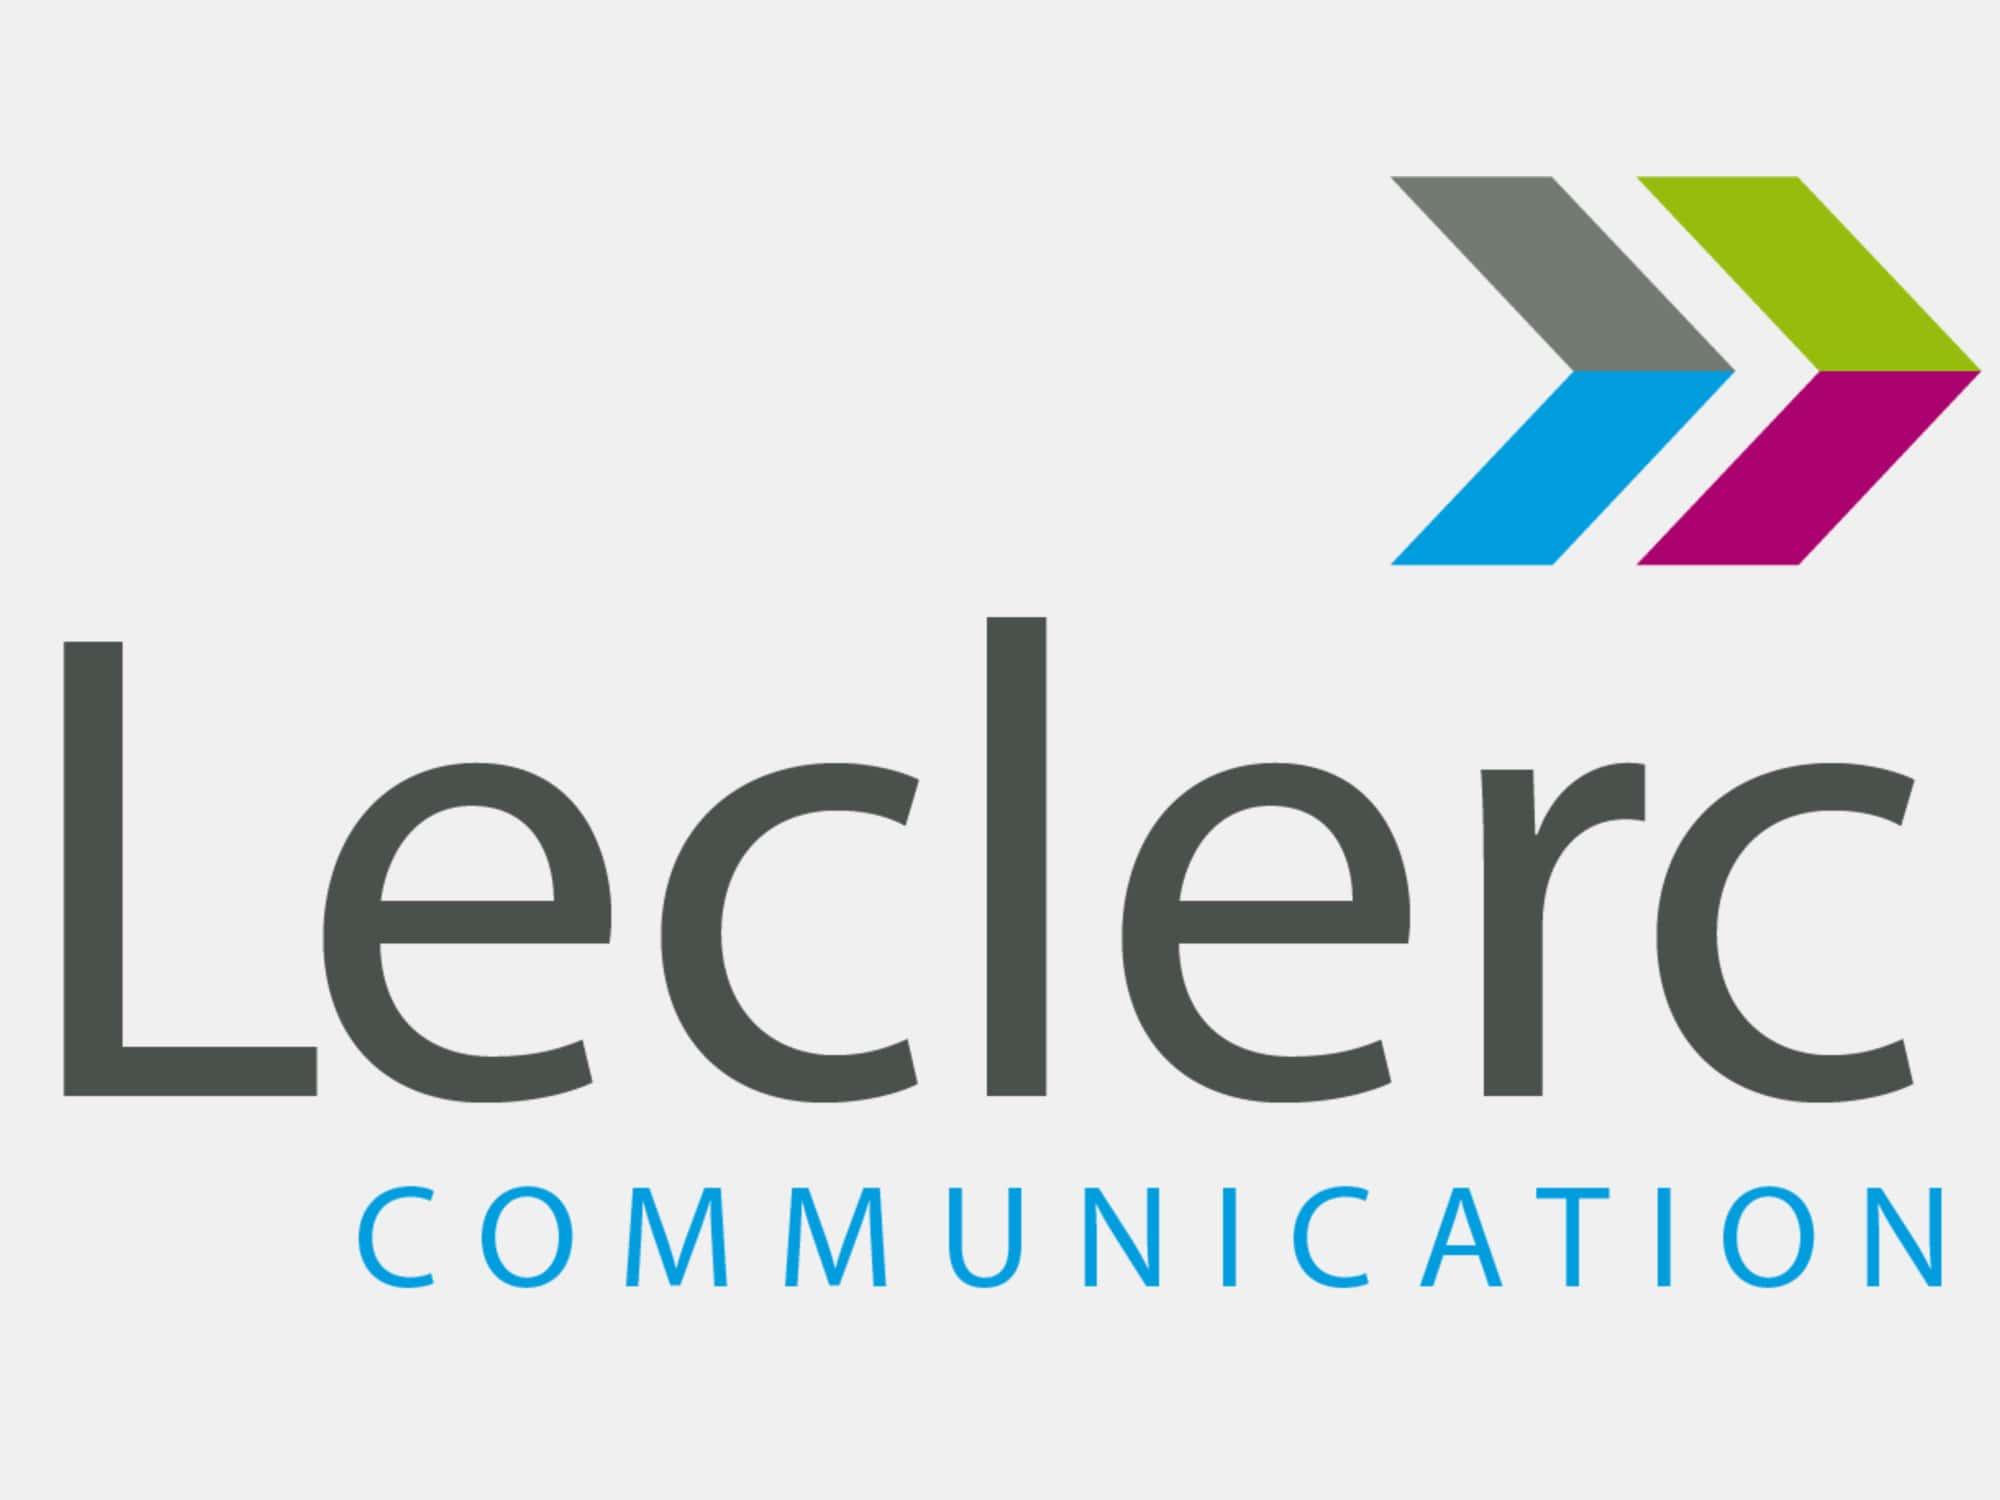 Leclerc Communication.jpg